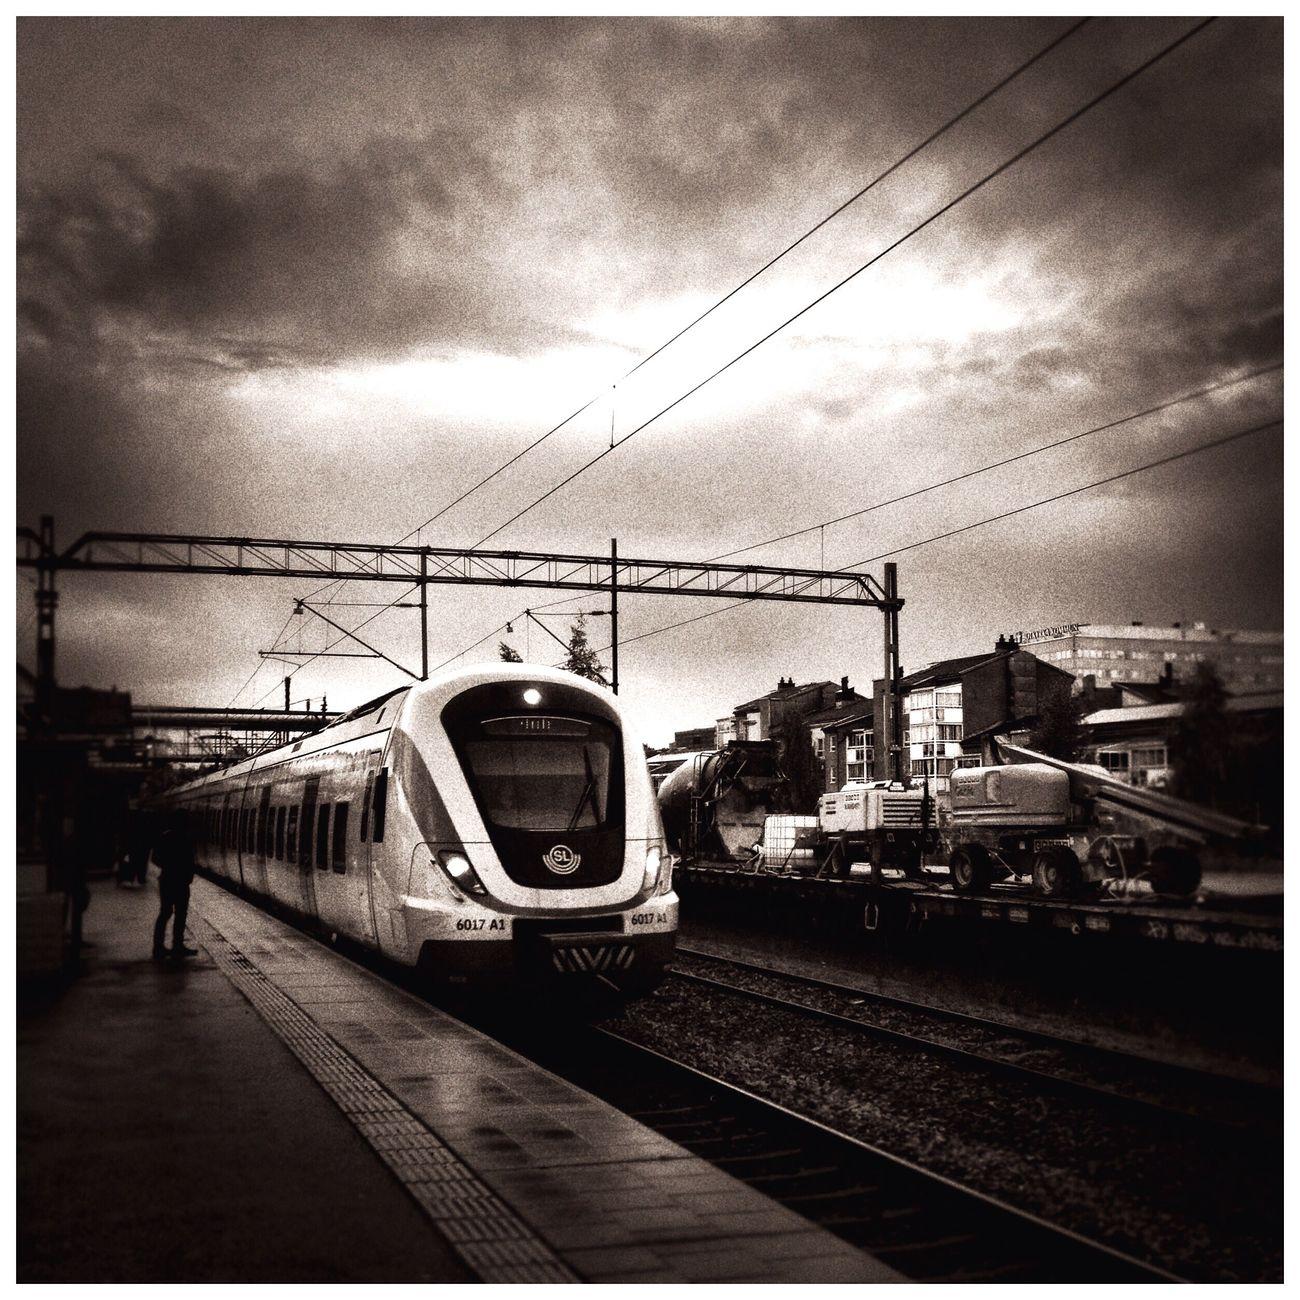 Commuting Train Station Traveling Rainy Days Monochrome